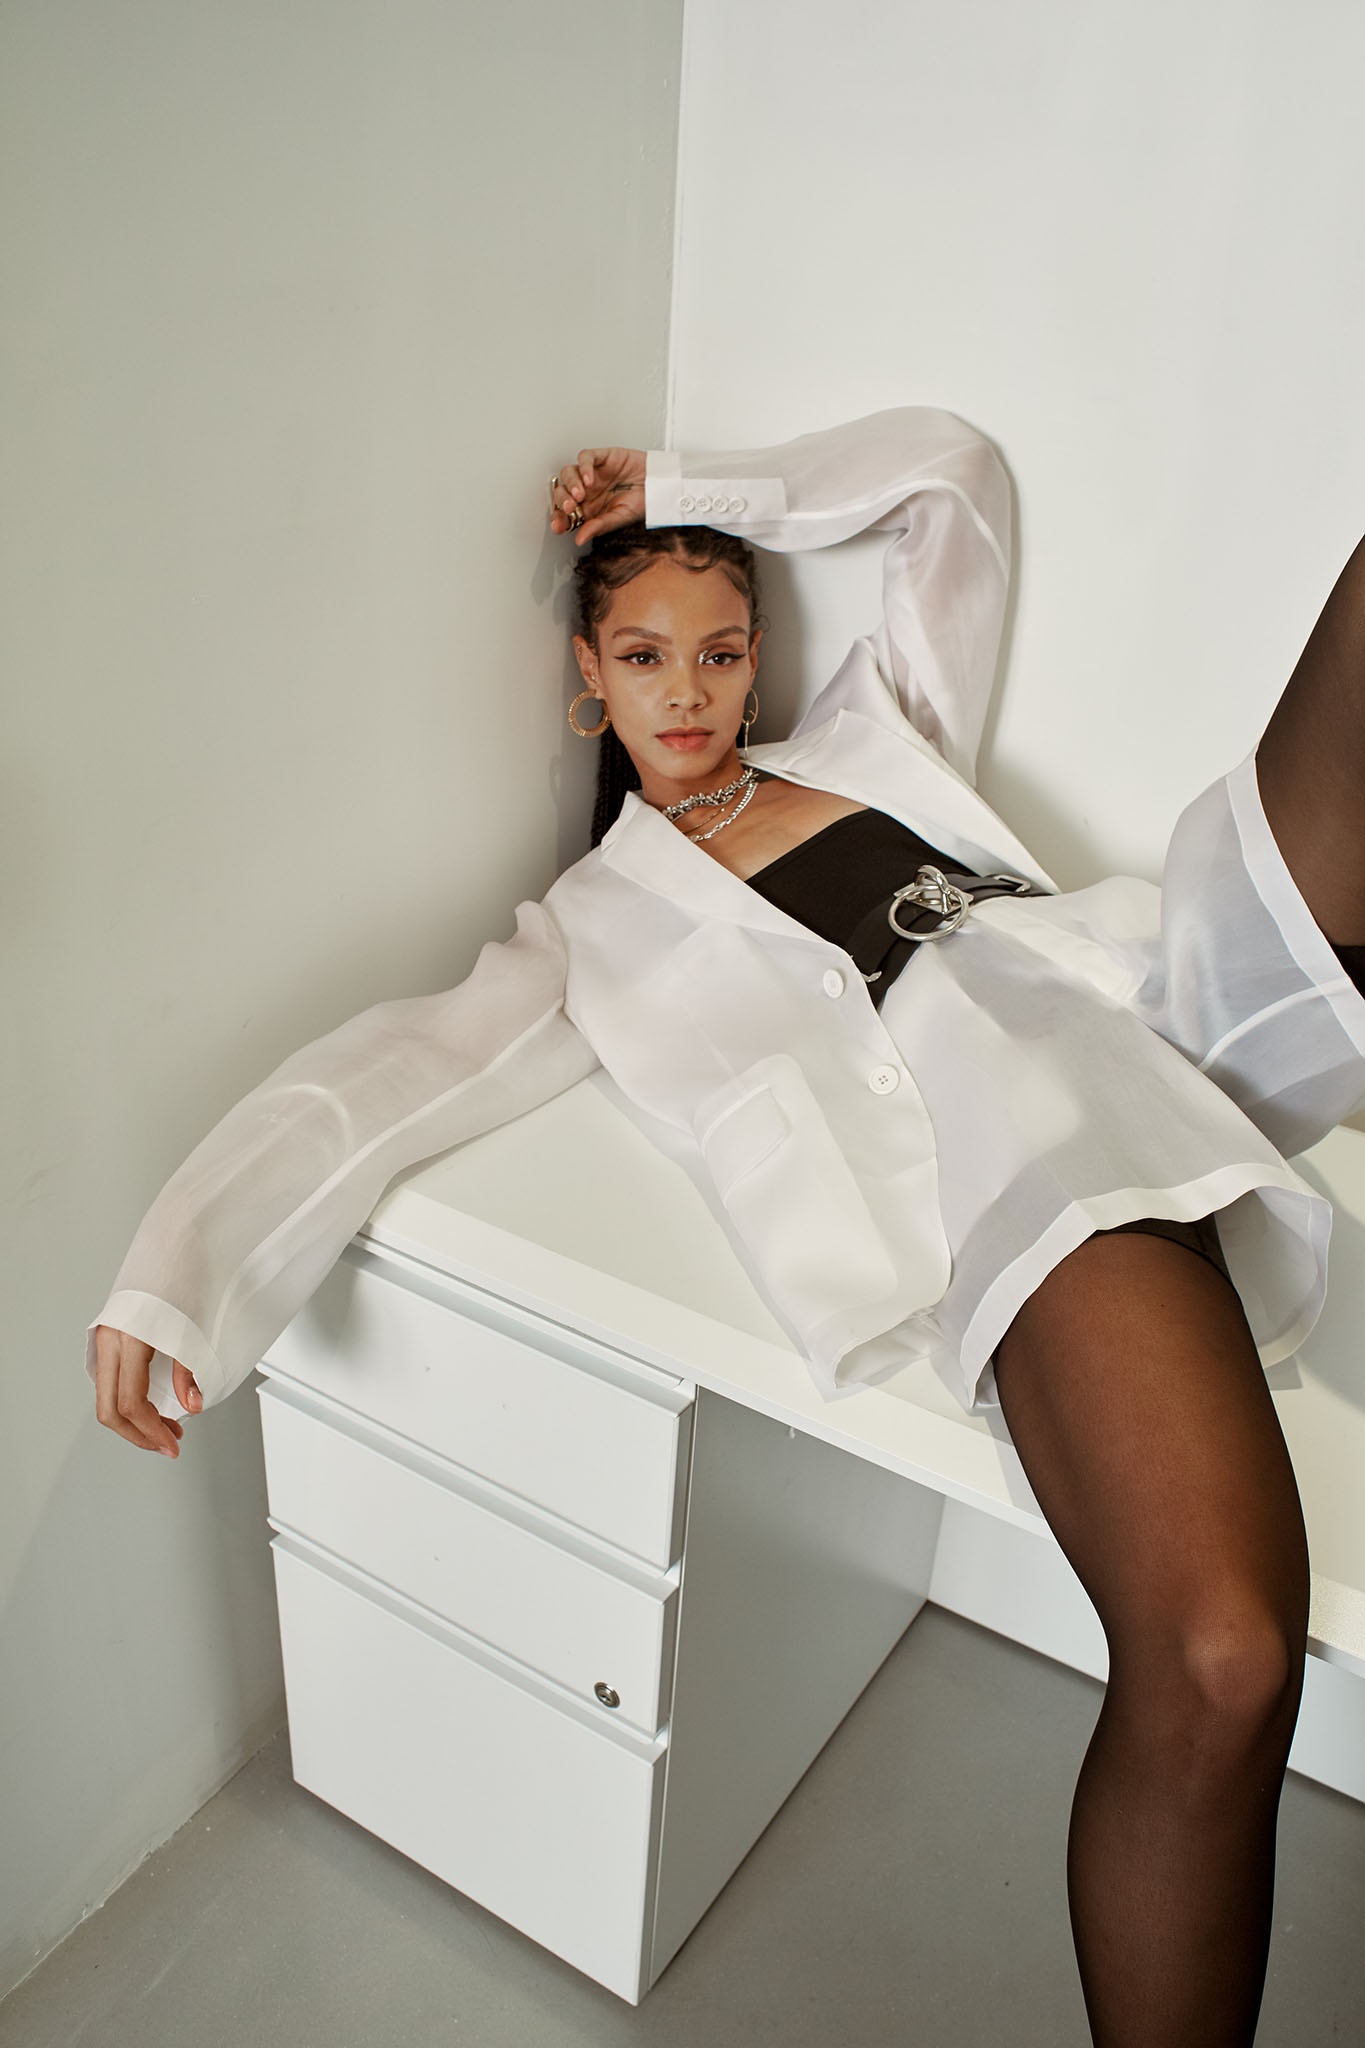 Helmut Lang's silk organza blazer and shorts over Skims' nylon and spandex bodysuit. Gaviria earrings; Jessica Biales necklace; Mounser necklace; Zana Bayne belt; Calzedonia tights.